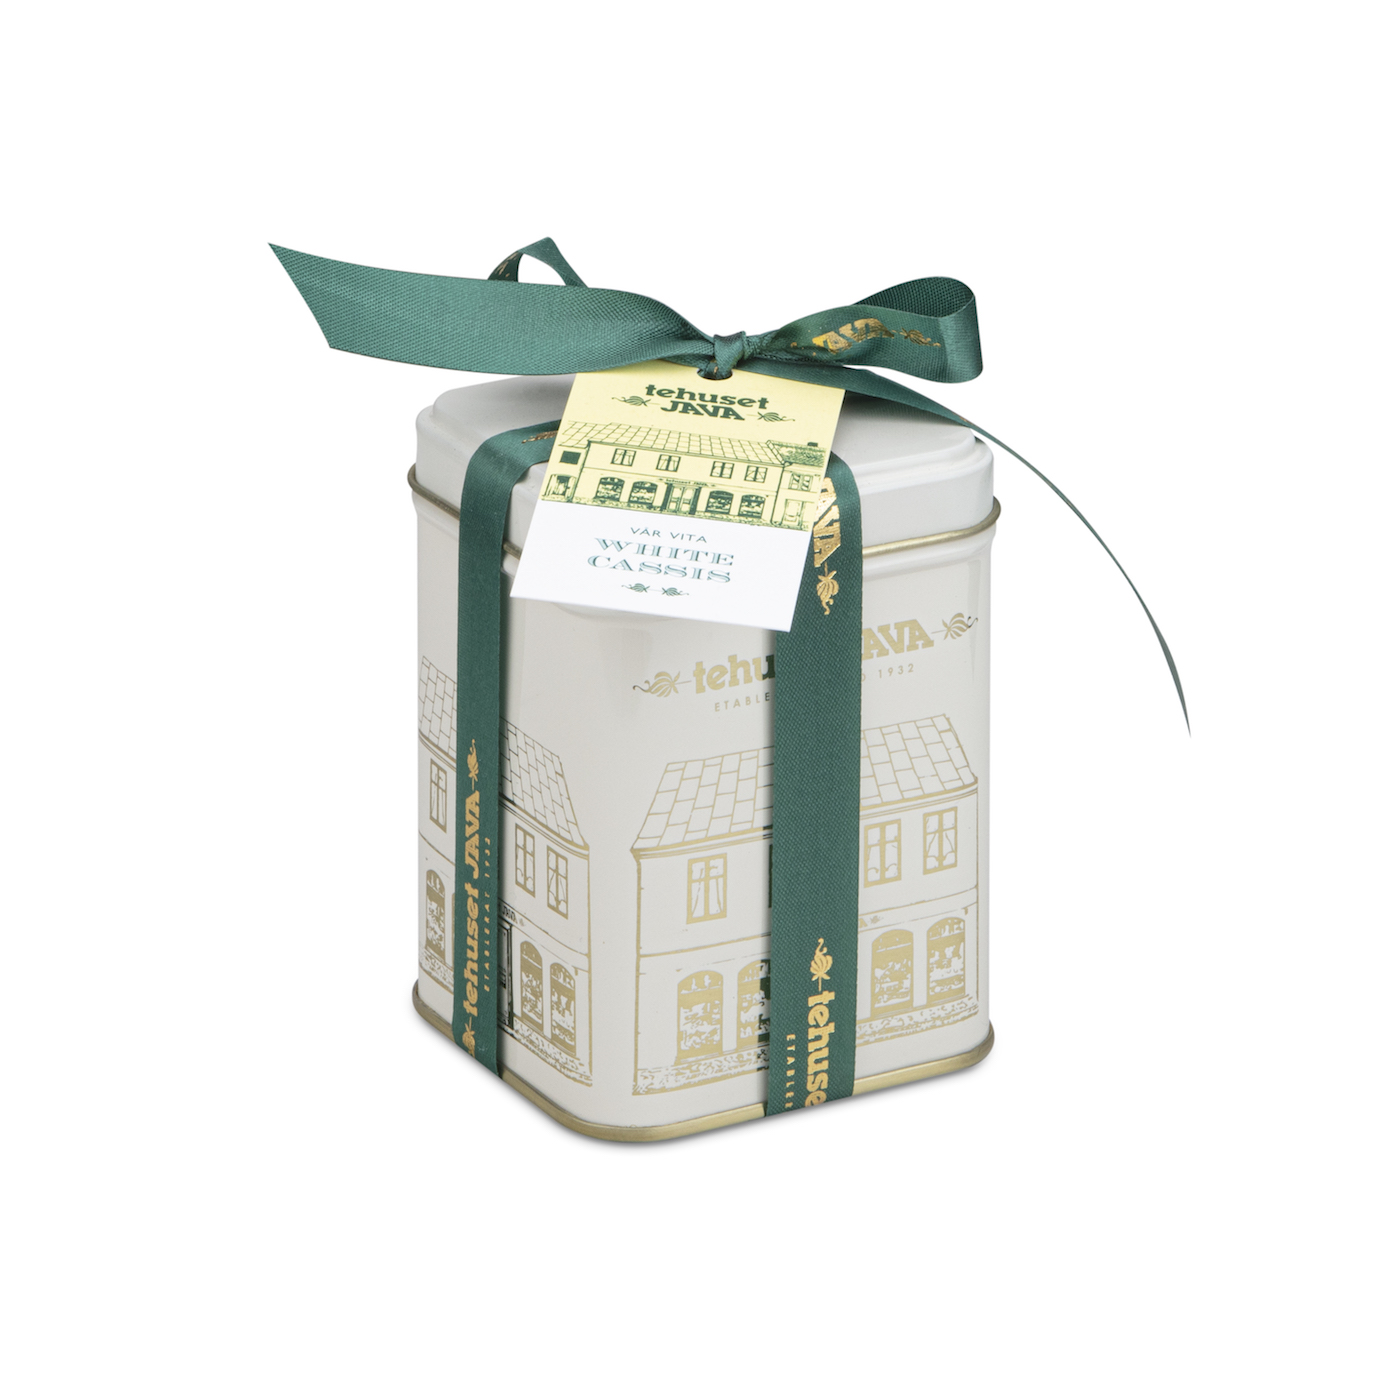 White Cassis i plåtburk 50g